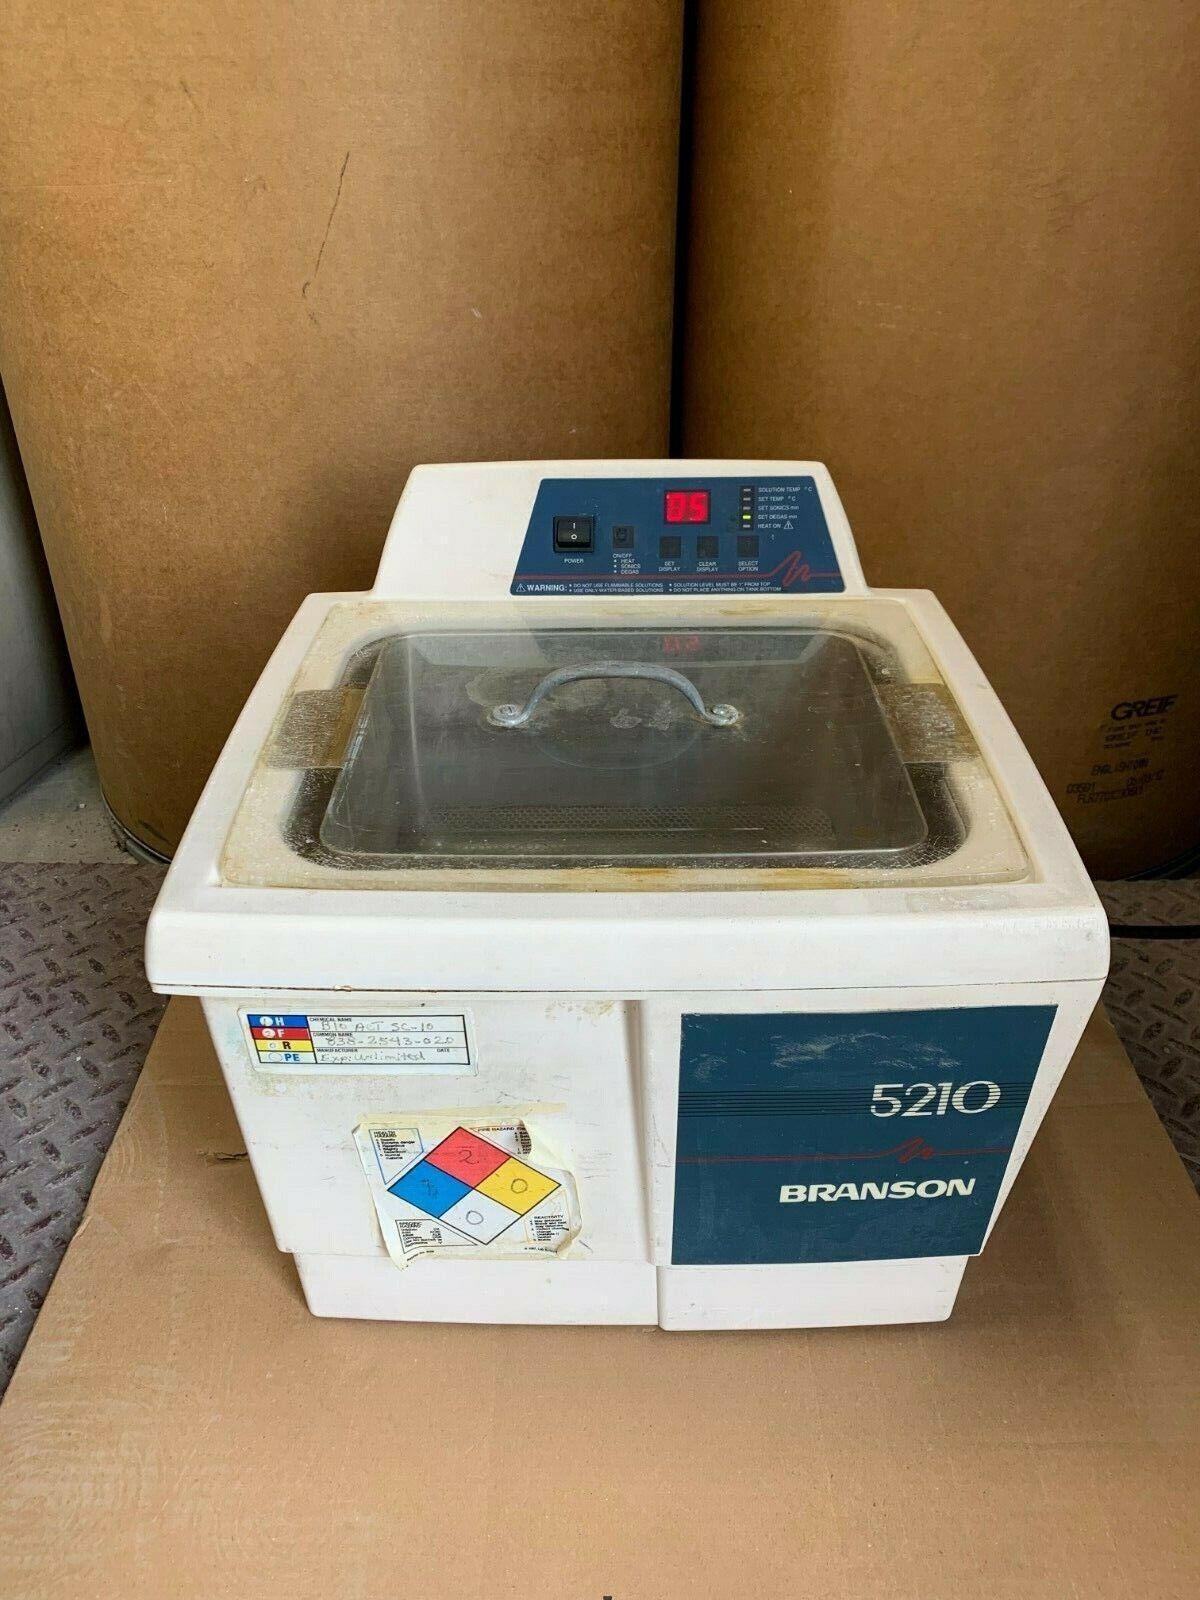 Branson 5210 5210R-DTH Ultrasonic Cleaner